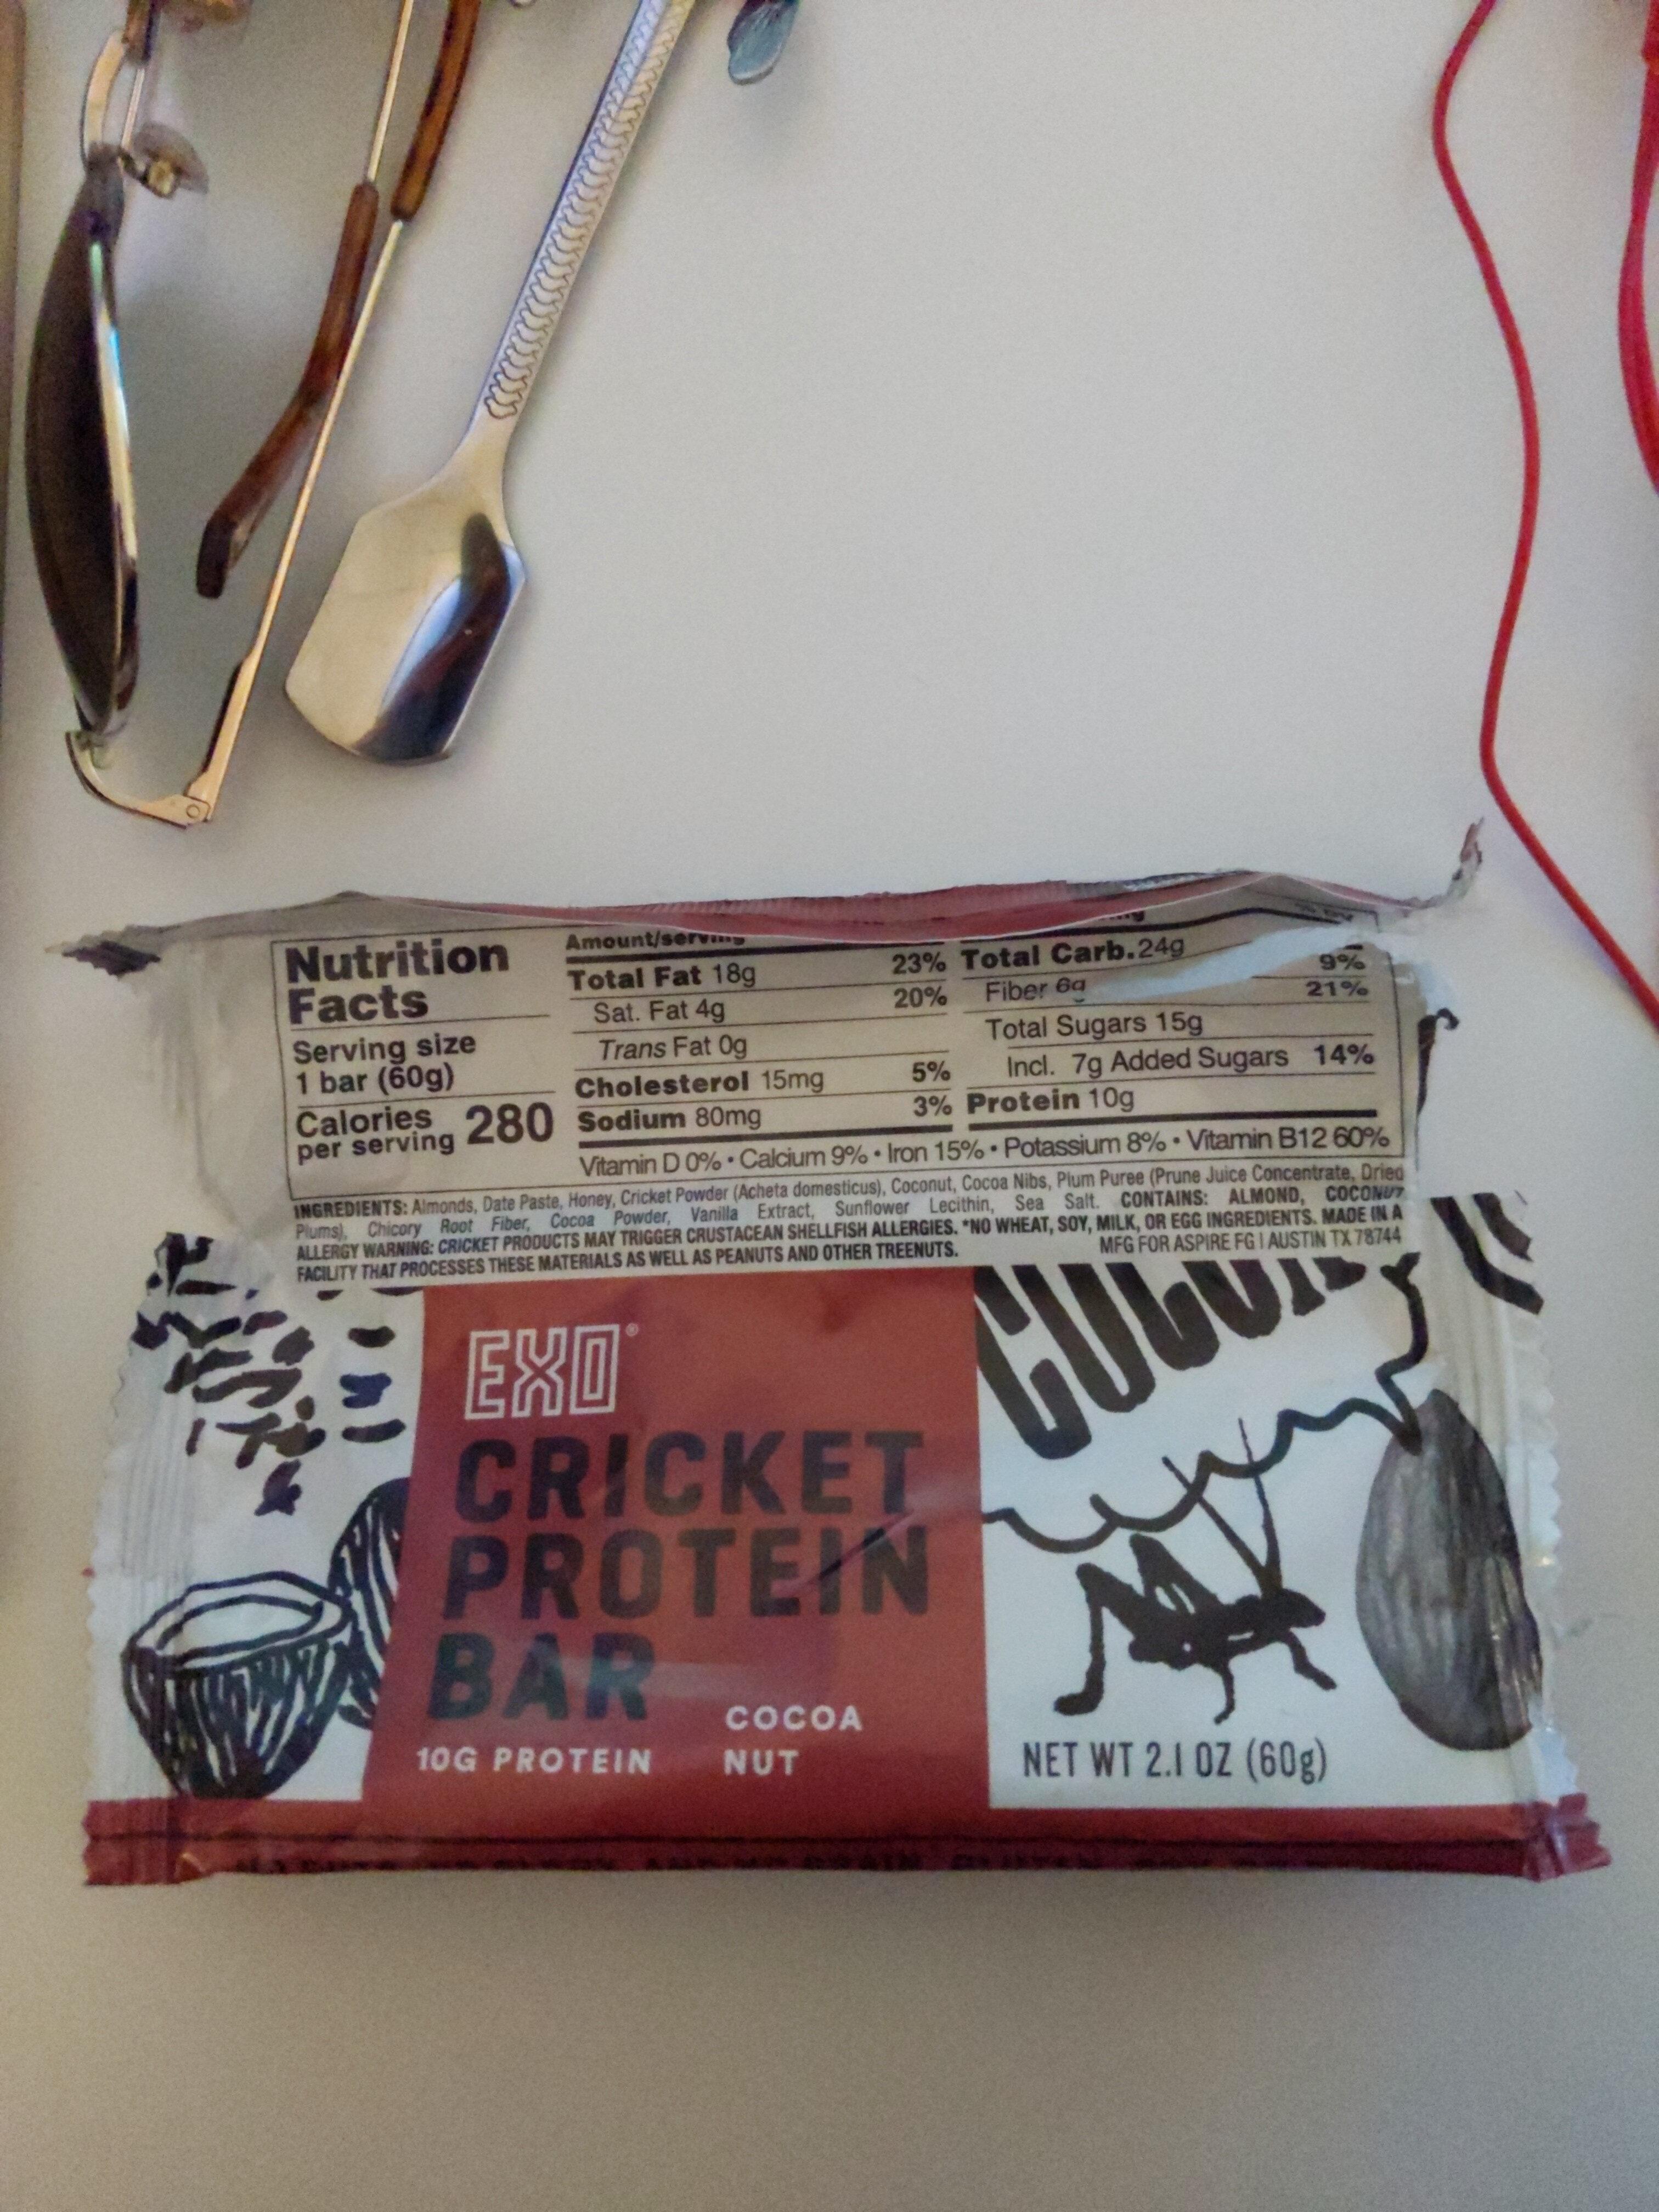 EXO Cricket Protein Bar Cocoa Nut - Ingredients - en